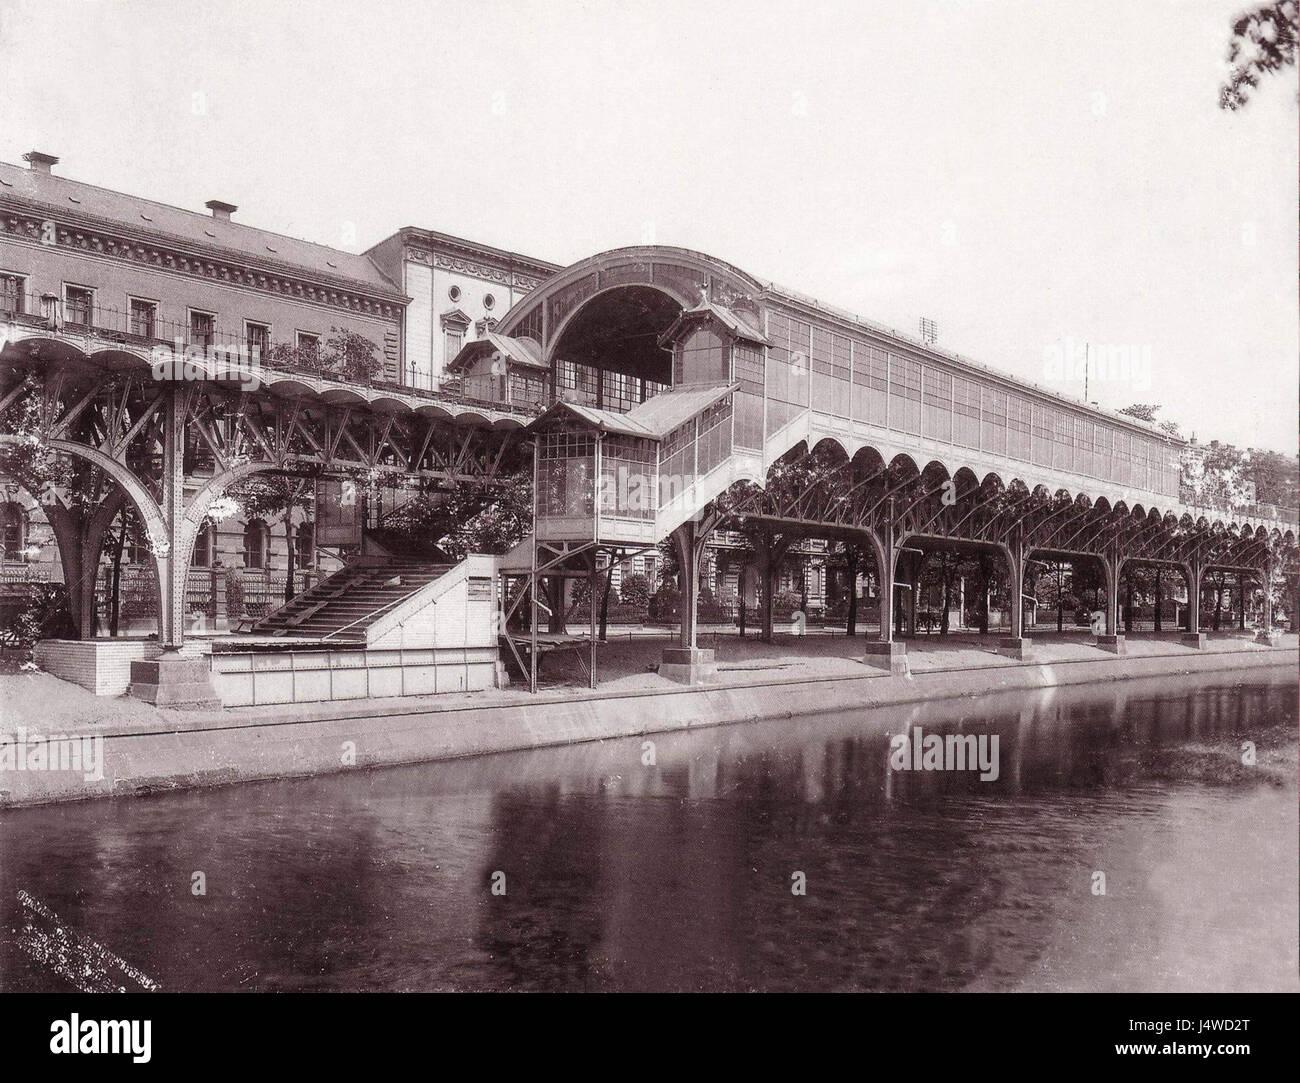 U Bahn Berlin Hochbahnhof Moeckernbruecke 1902 Aussenansicht Stock Photo